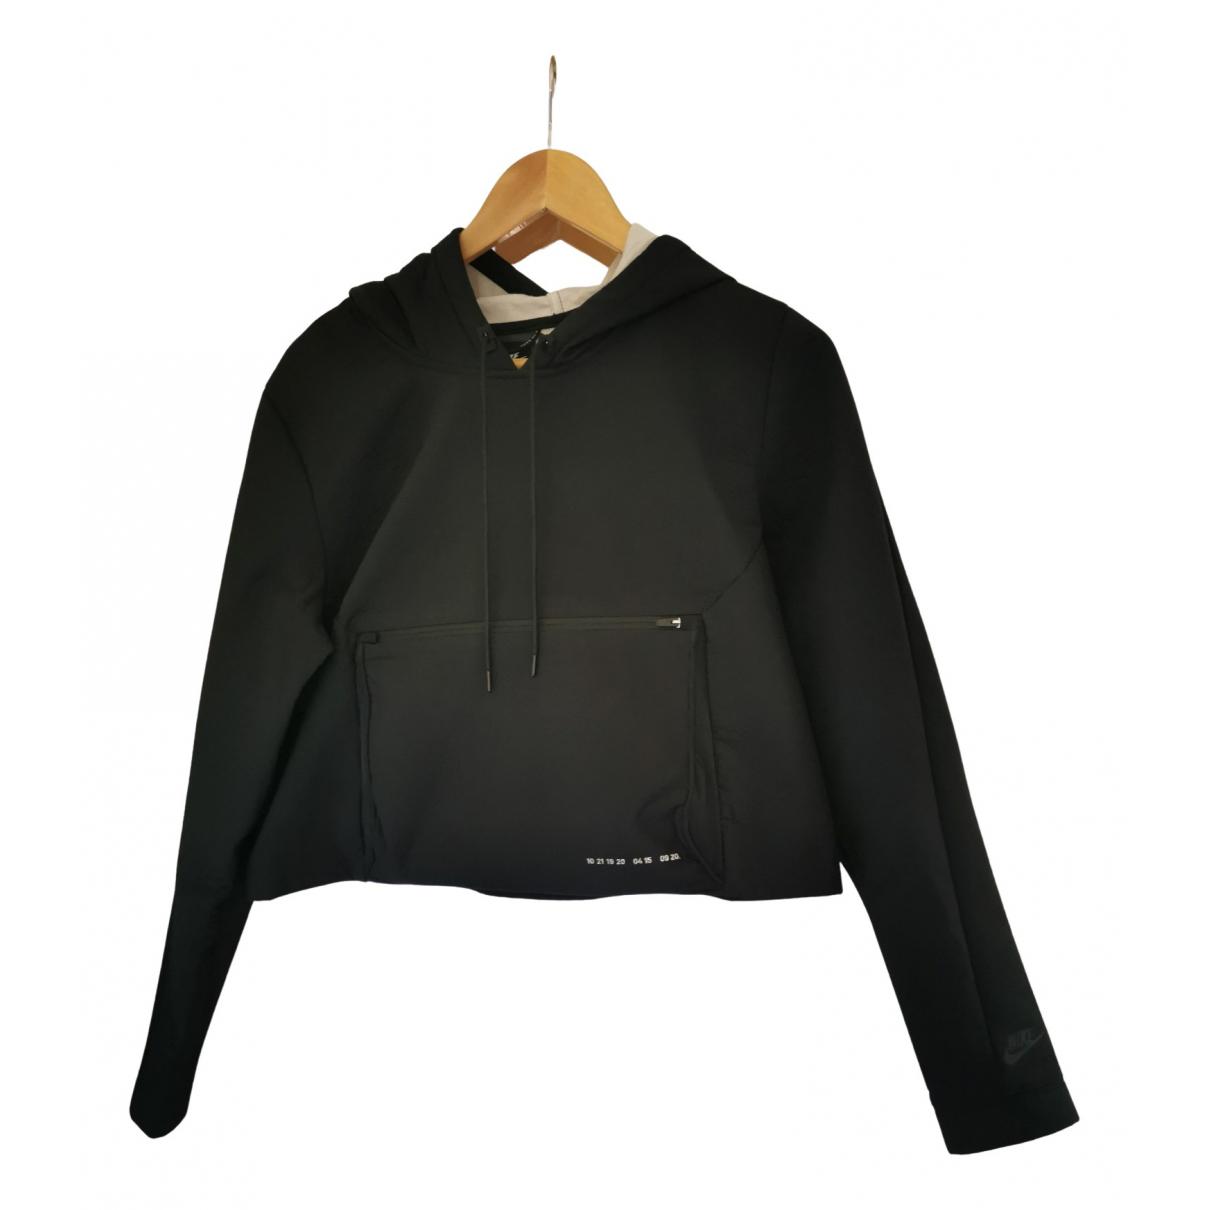 Nike \N Jacke in  Schwarz Polyester